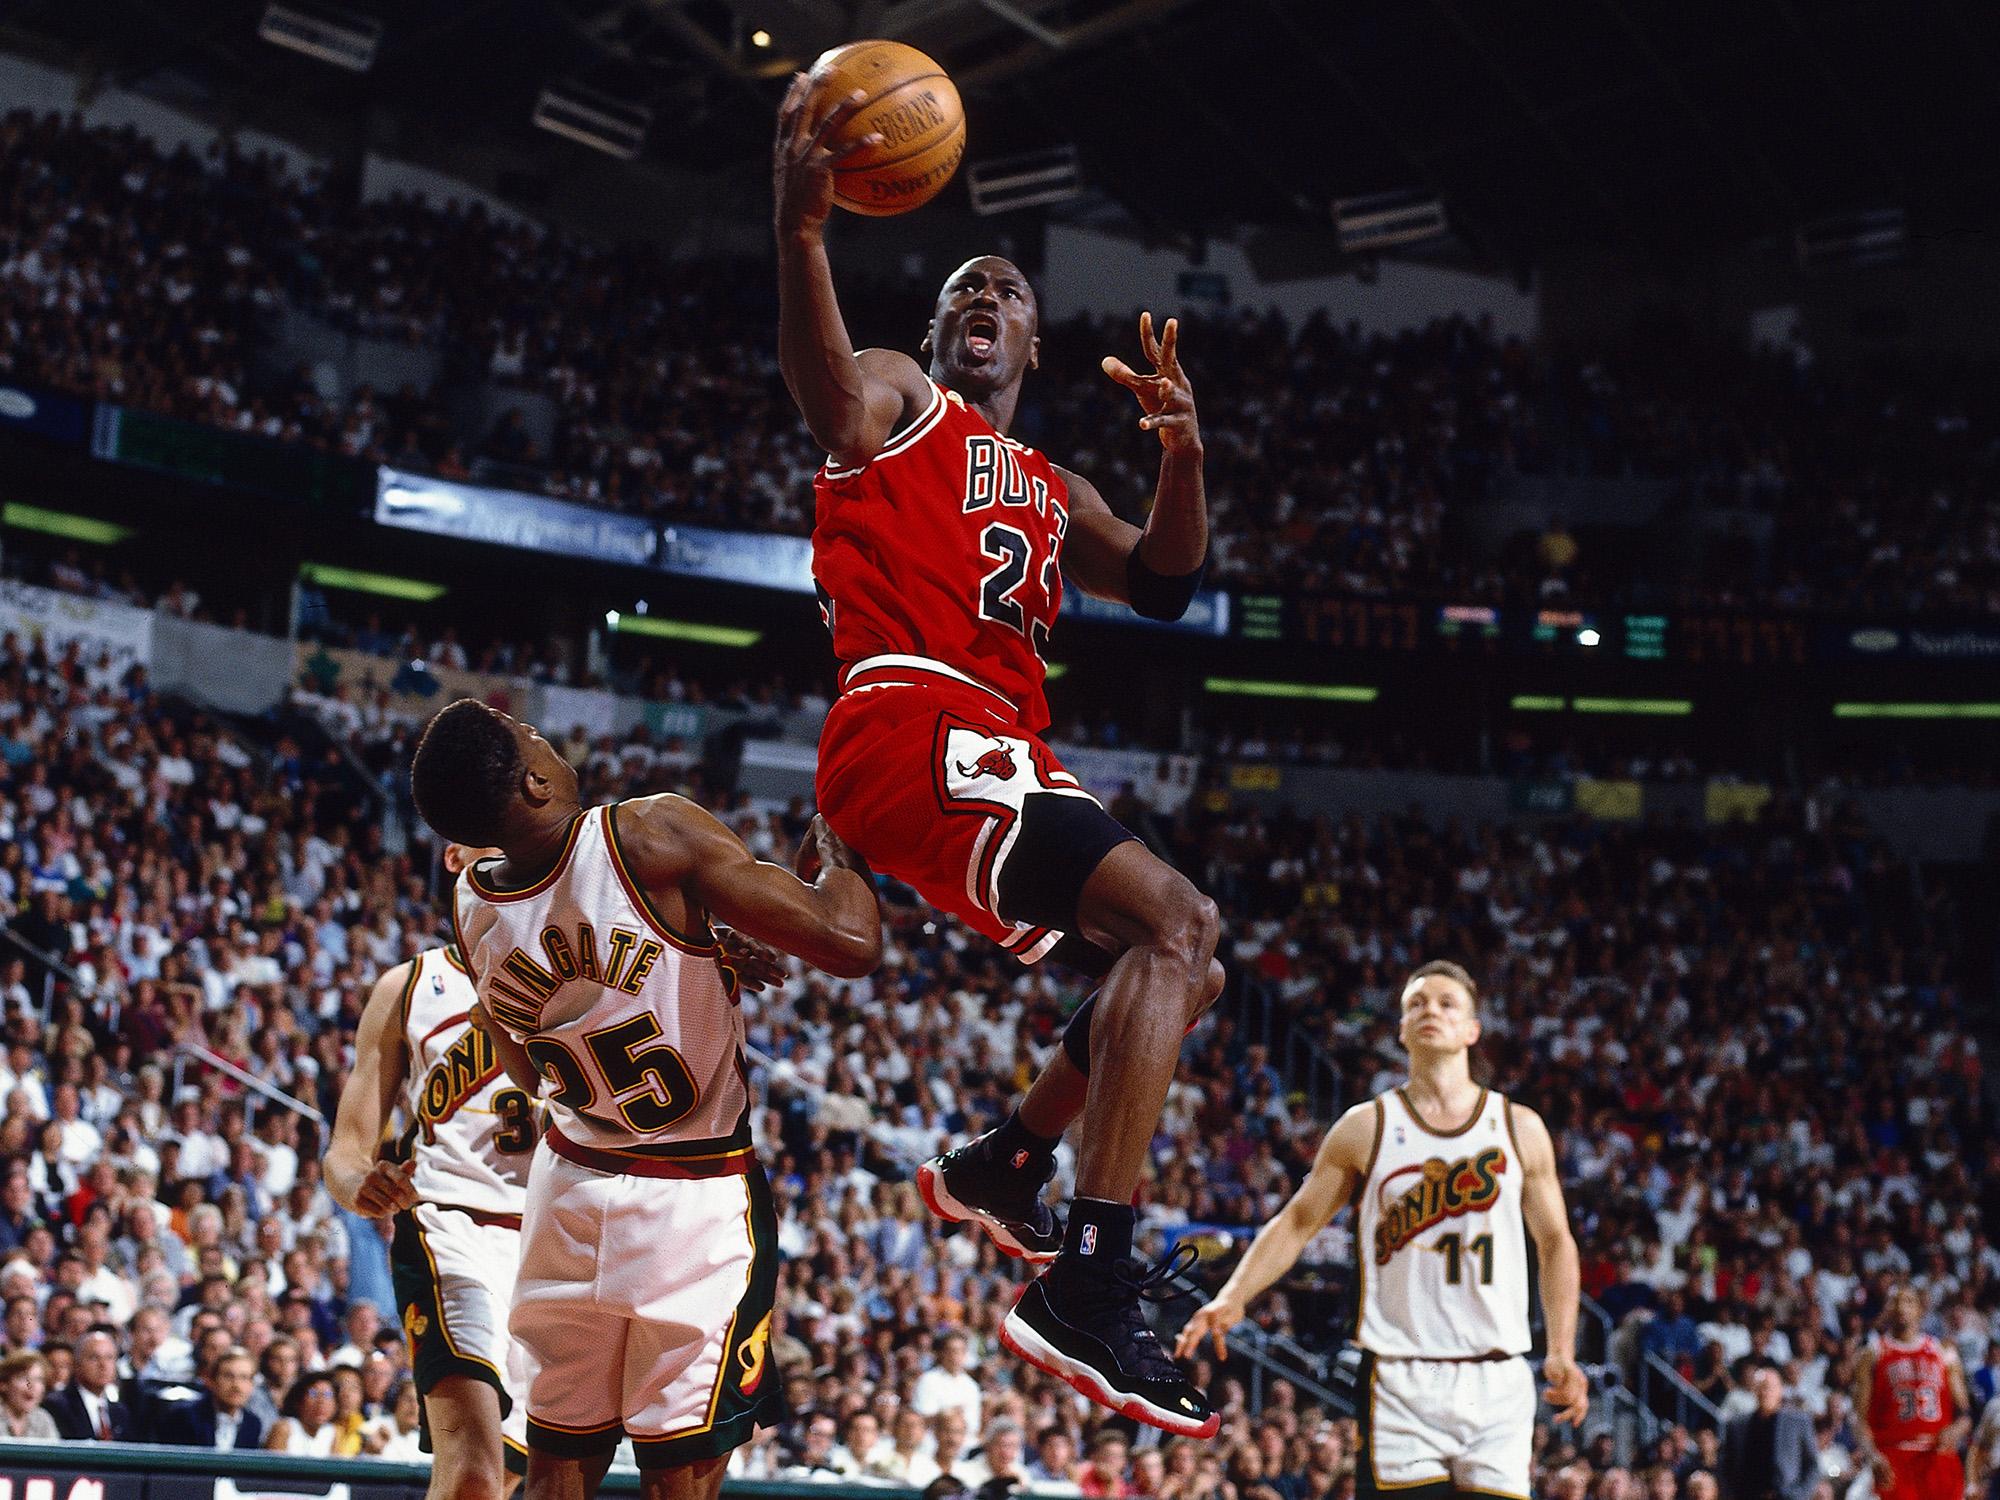 59fa0c42d74 Air Jordan 11: Ranking the greatest colorways | SI.com